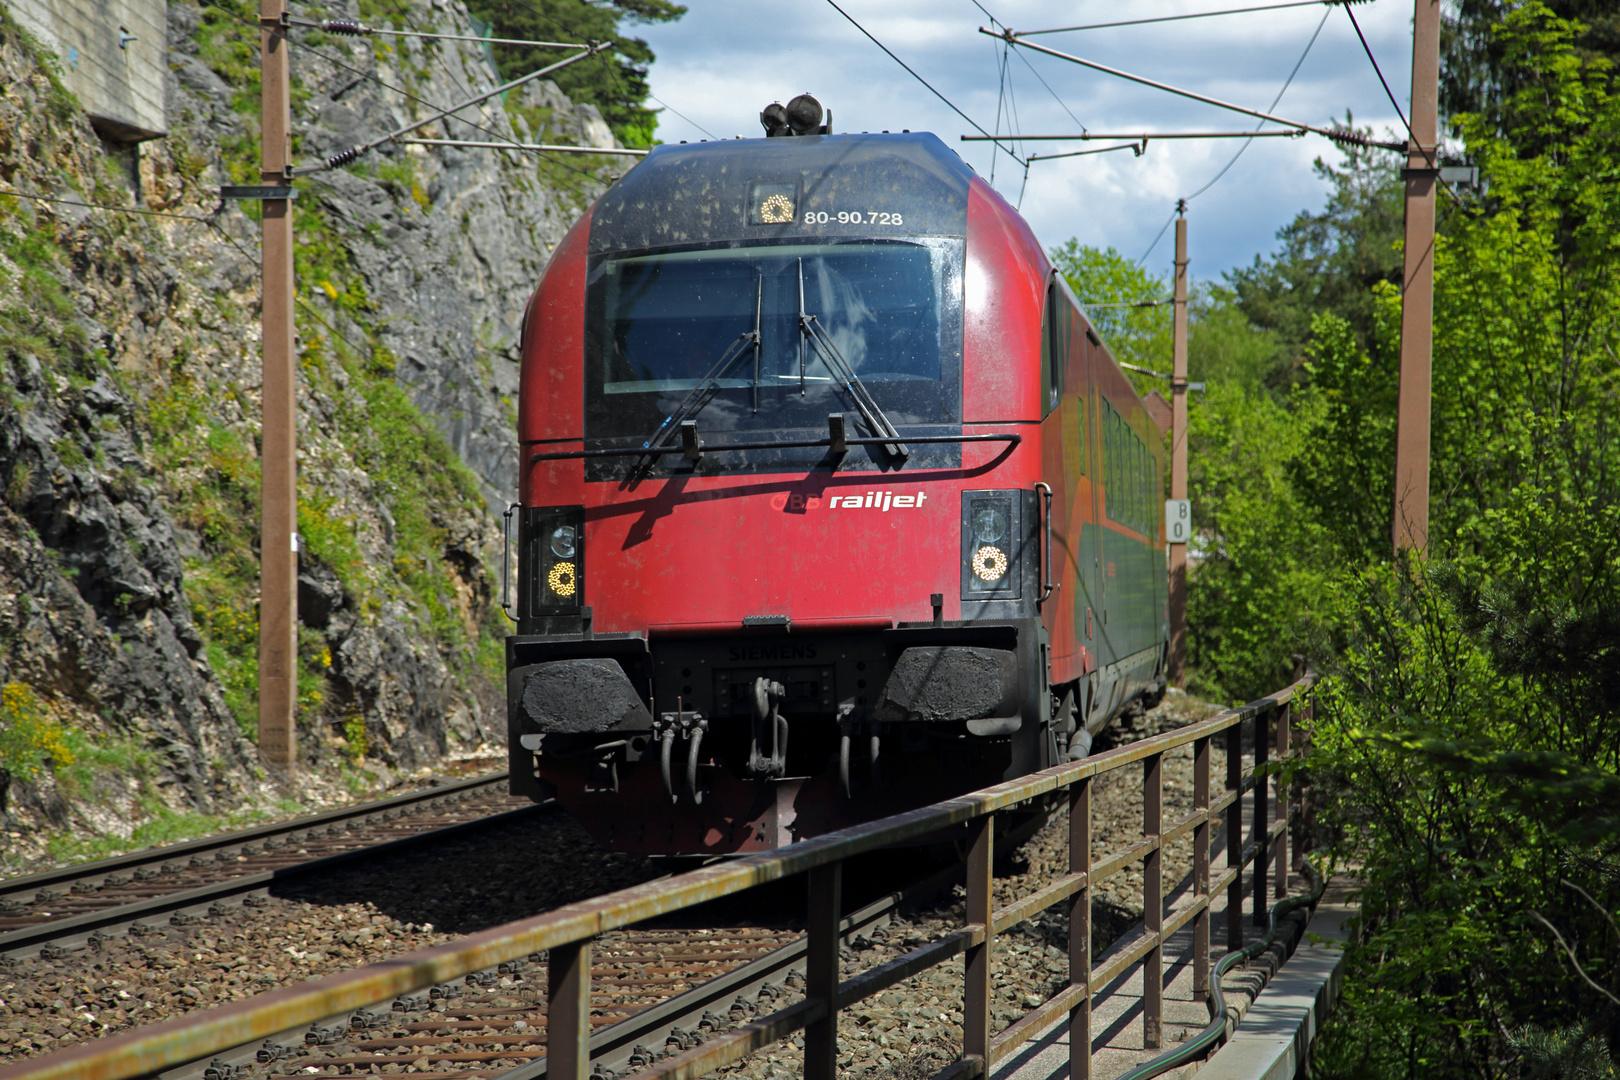 'railjet 80-90.728'